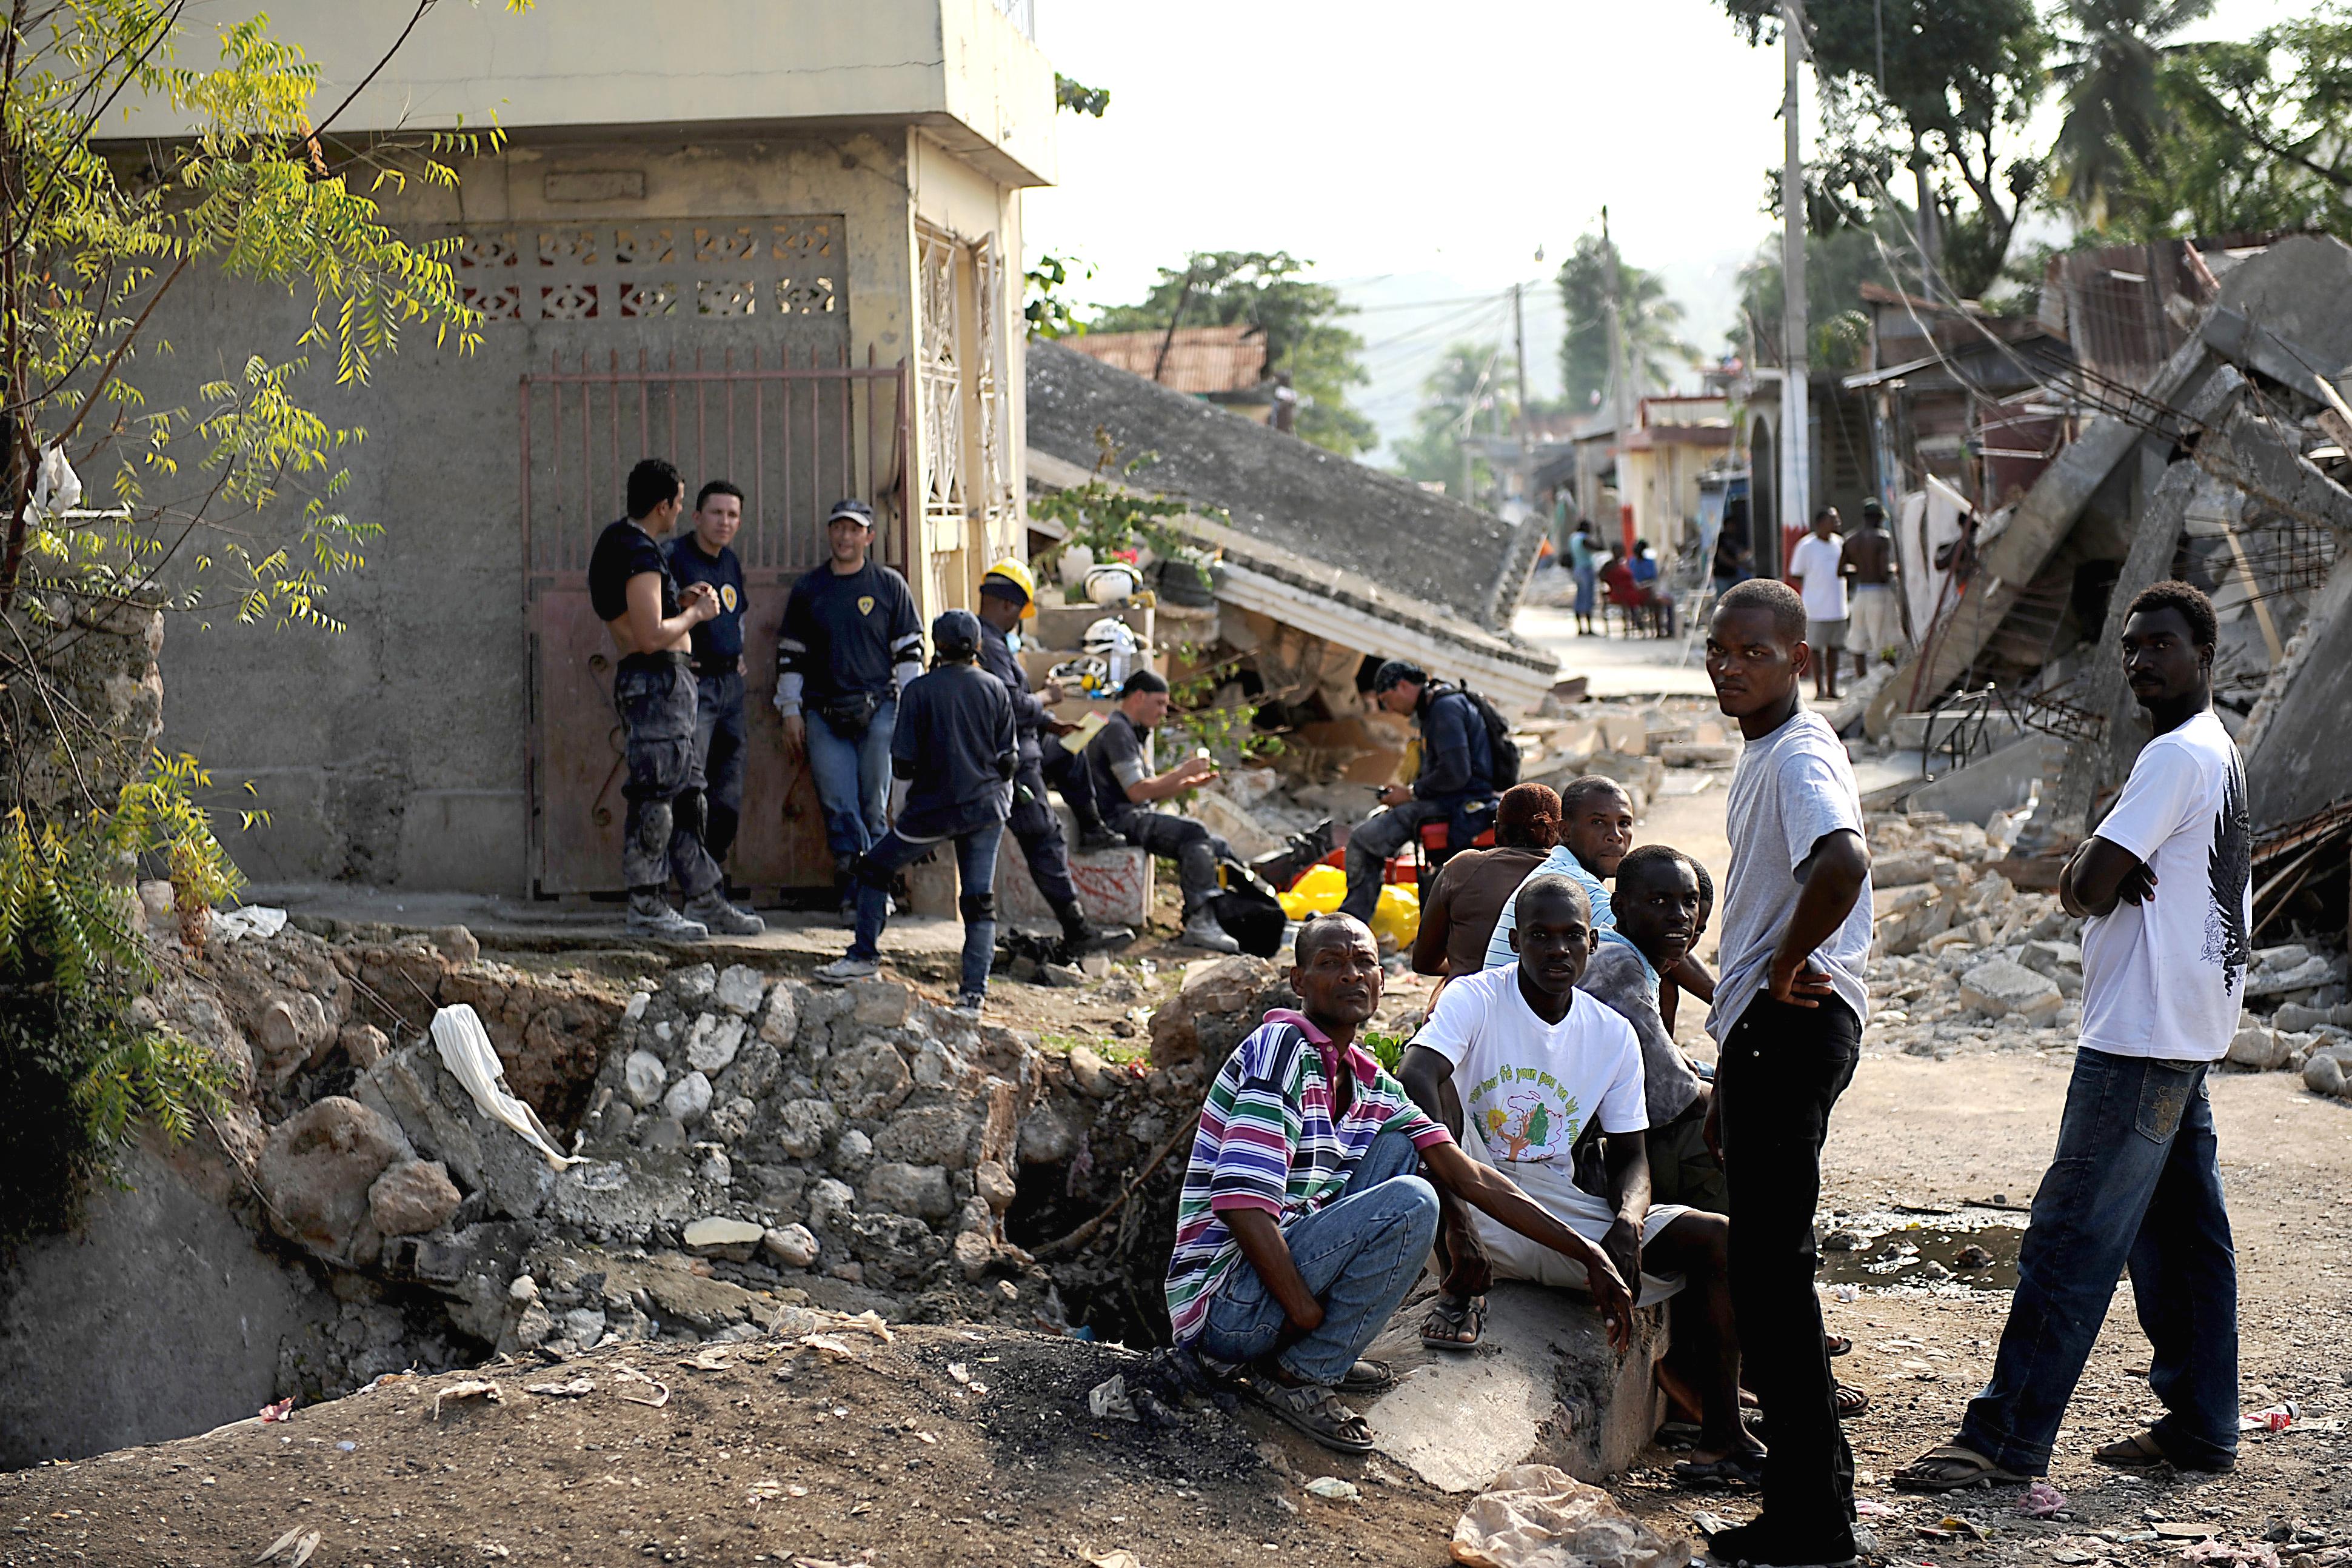 file residents in jacmel amid earthquake damage jpg file residents in jacmel amid earthquake damage 2010 01 17 1 jpg